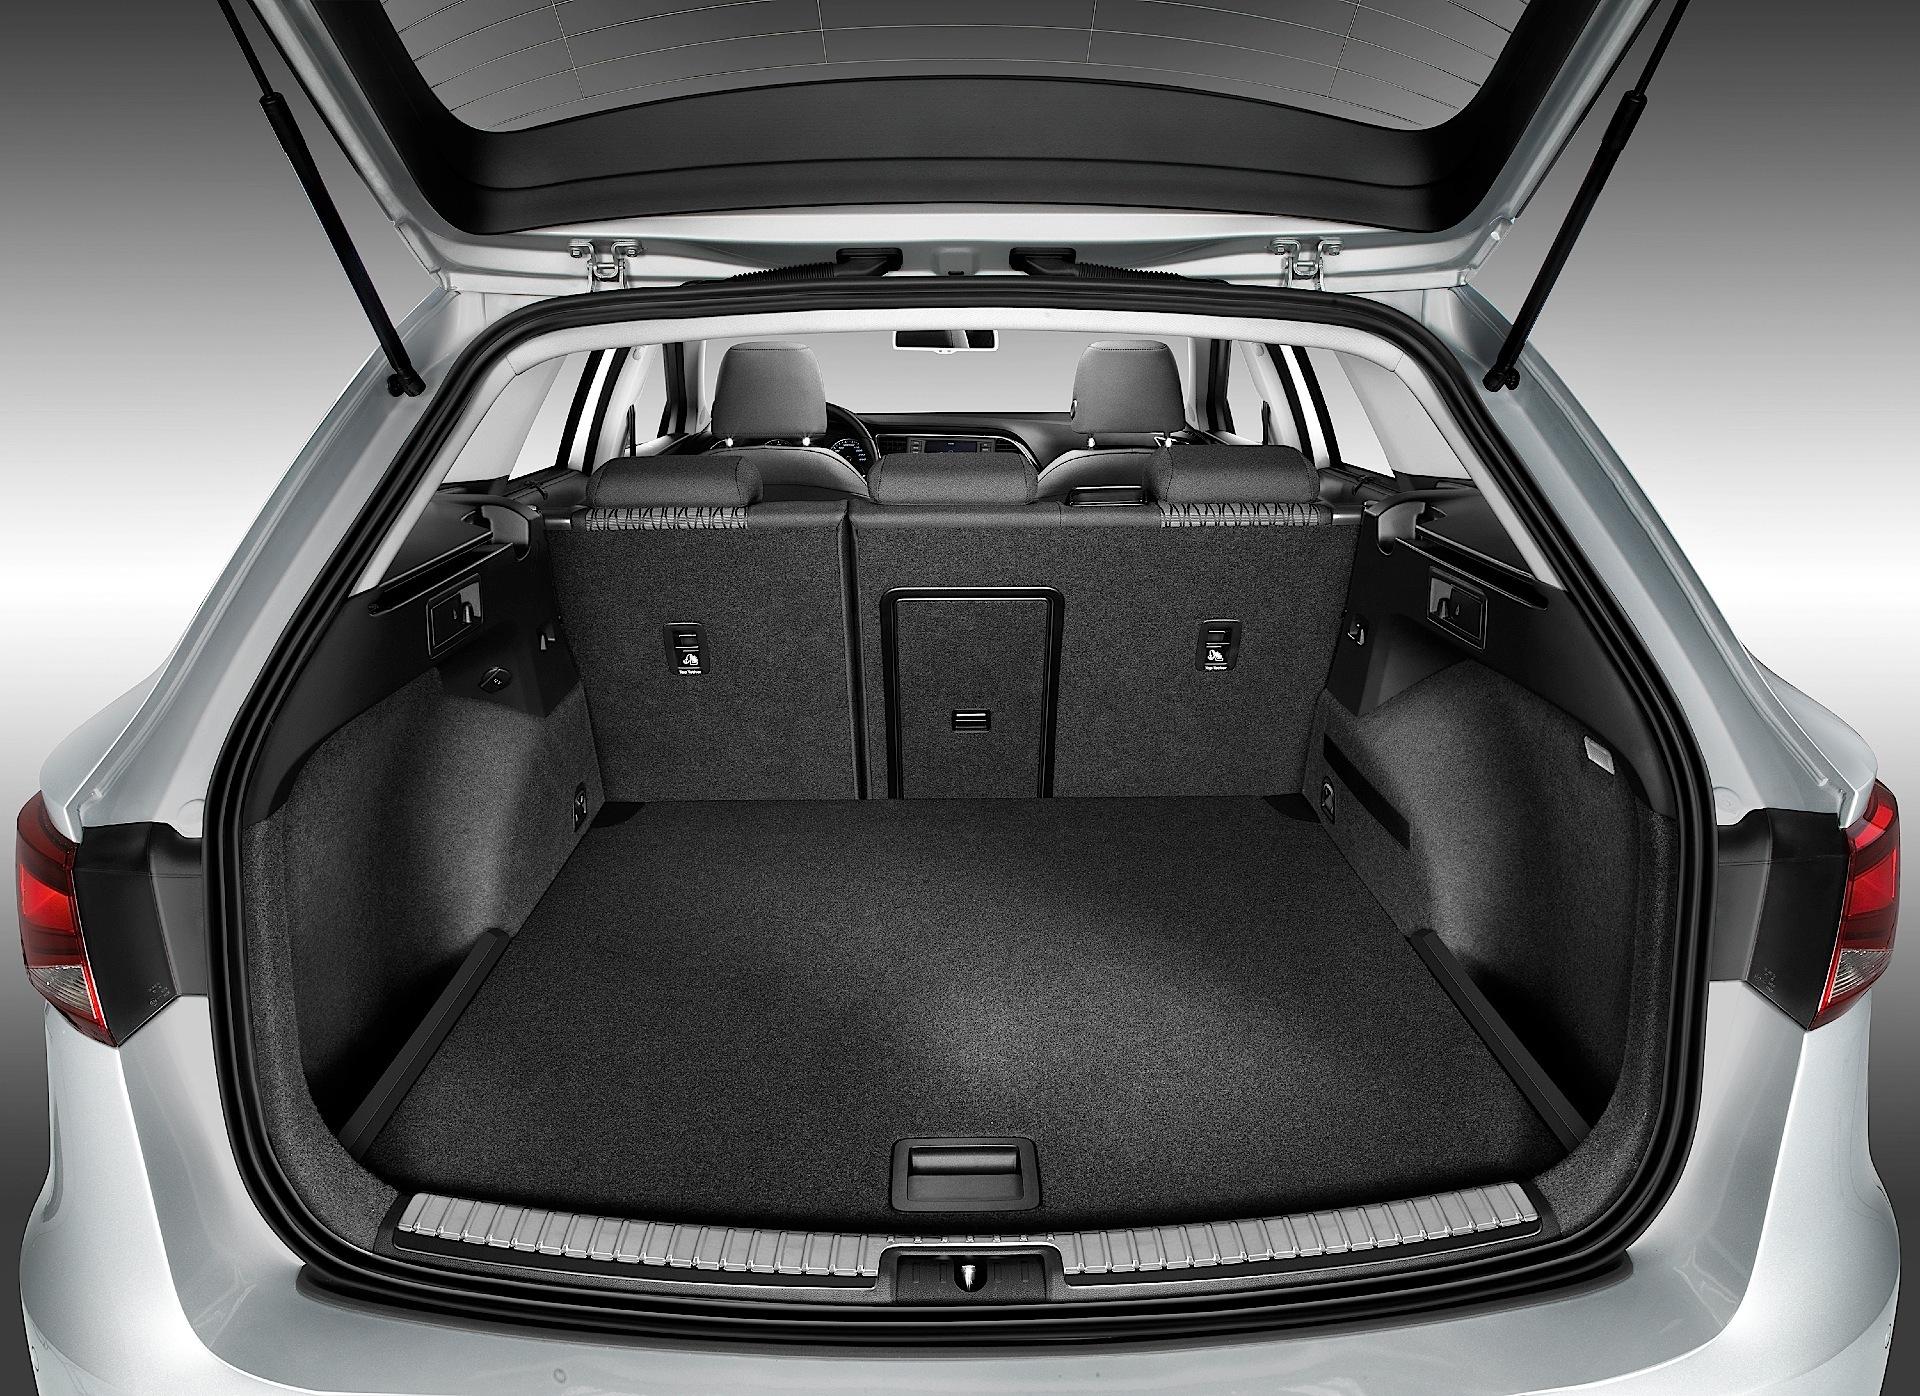 seat leon st estate specs 2013 2014 2015 2016 2017 2018 autoevolution. Black Bedroom Furniture Sets. Home Design Ideas